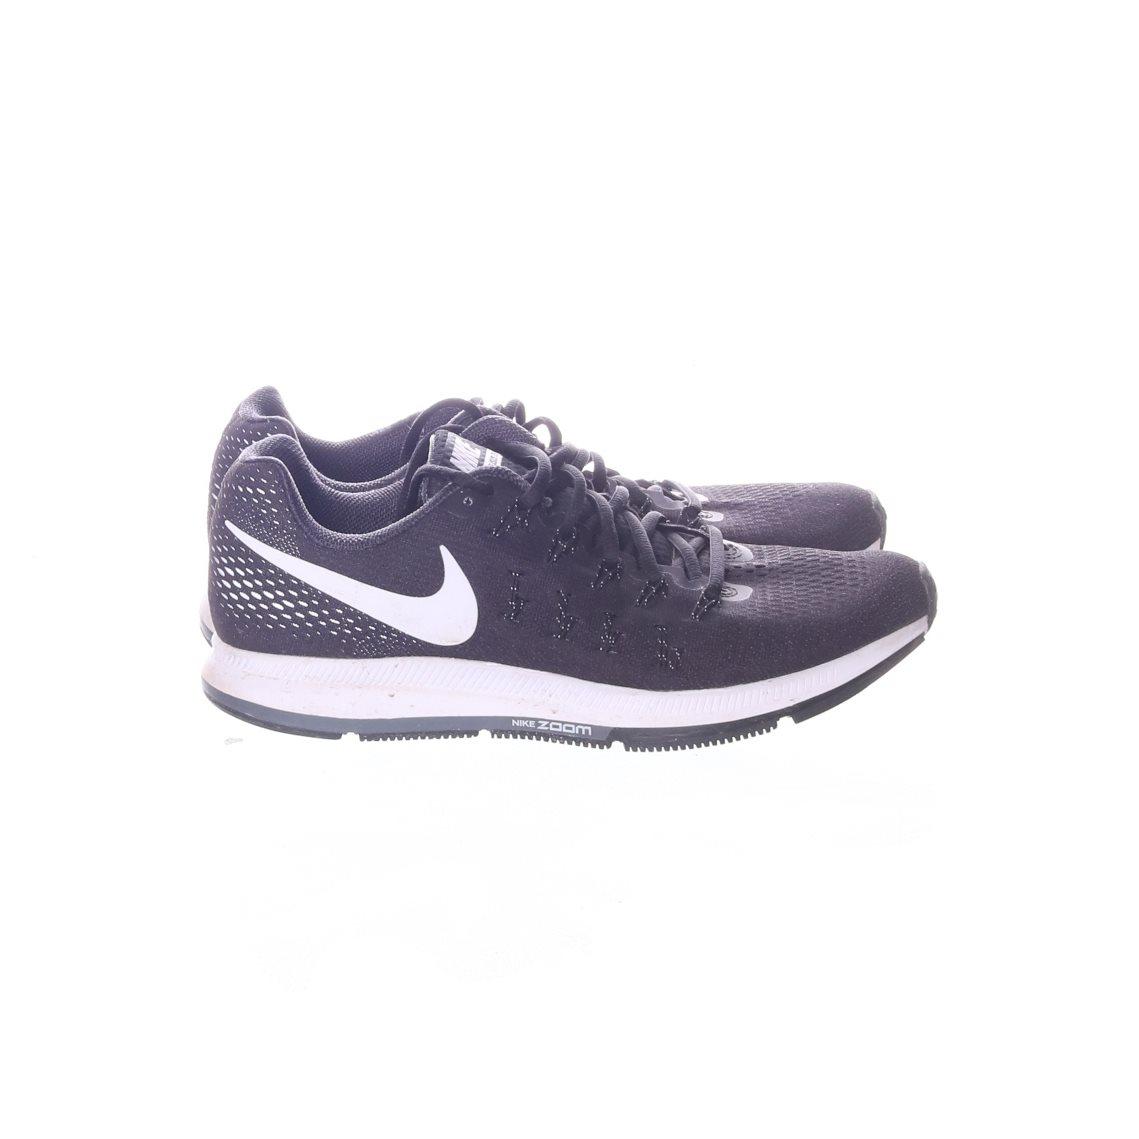 new product 94647 639b5 Nike, Gymnastikskor, Strl 43, Svart